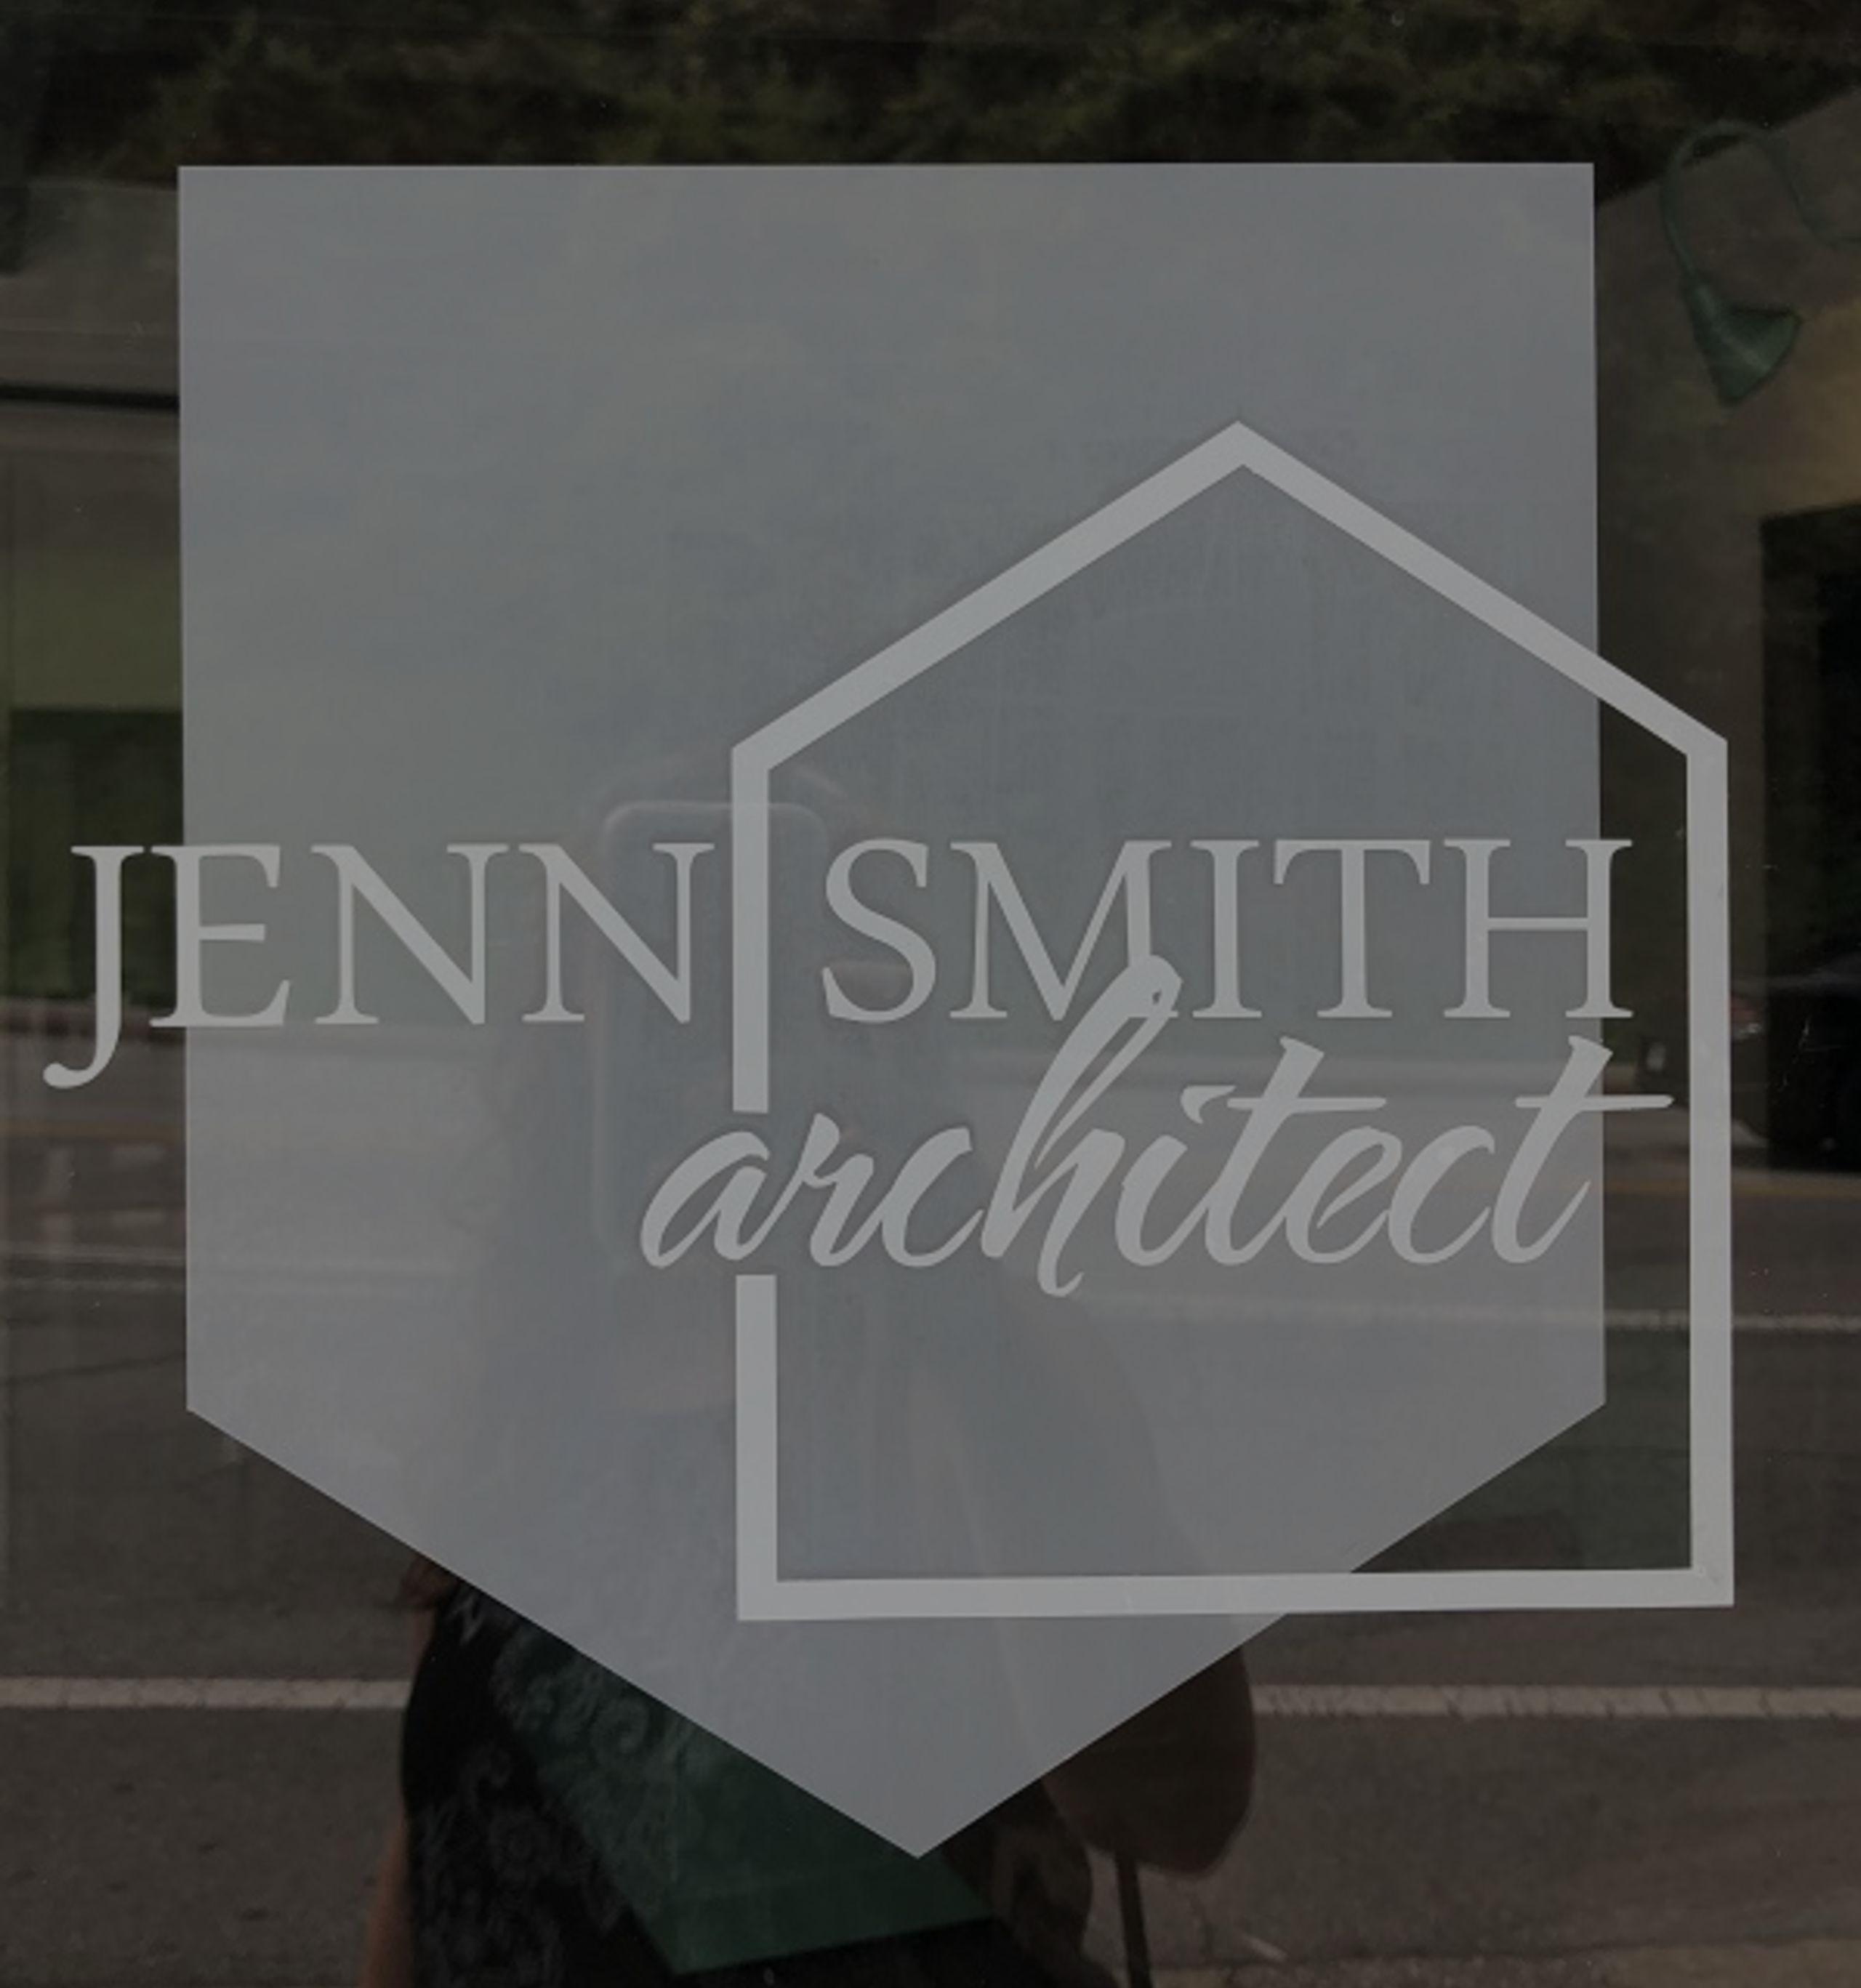 Jenn Smith Architect Spotlight